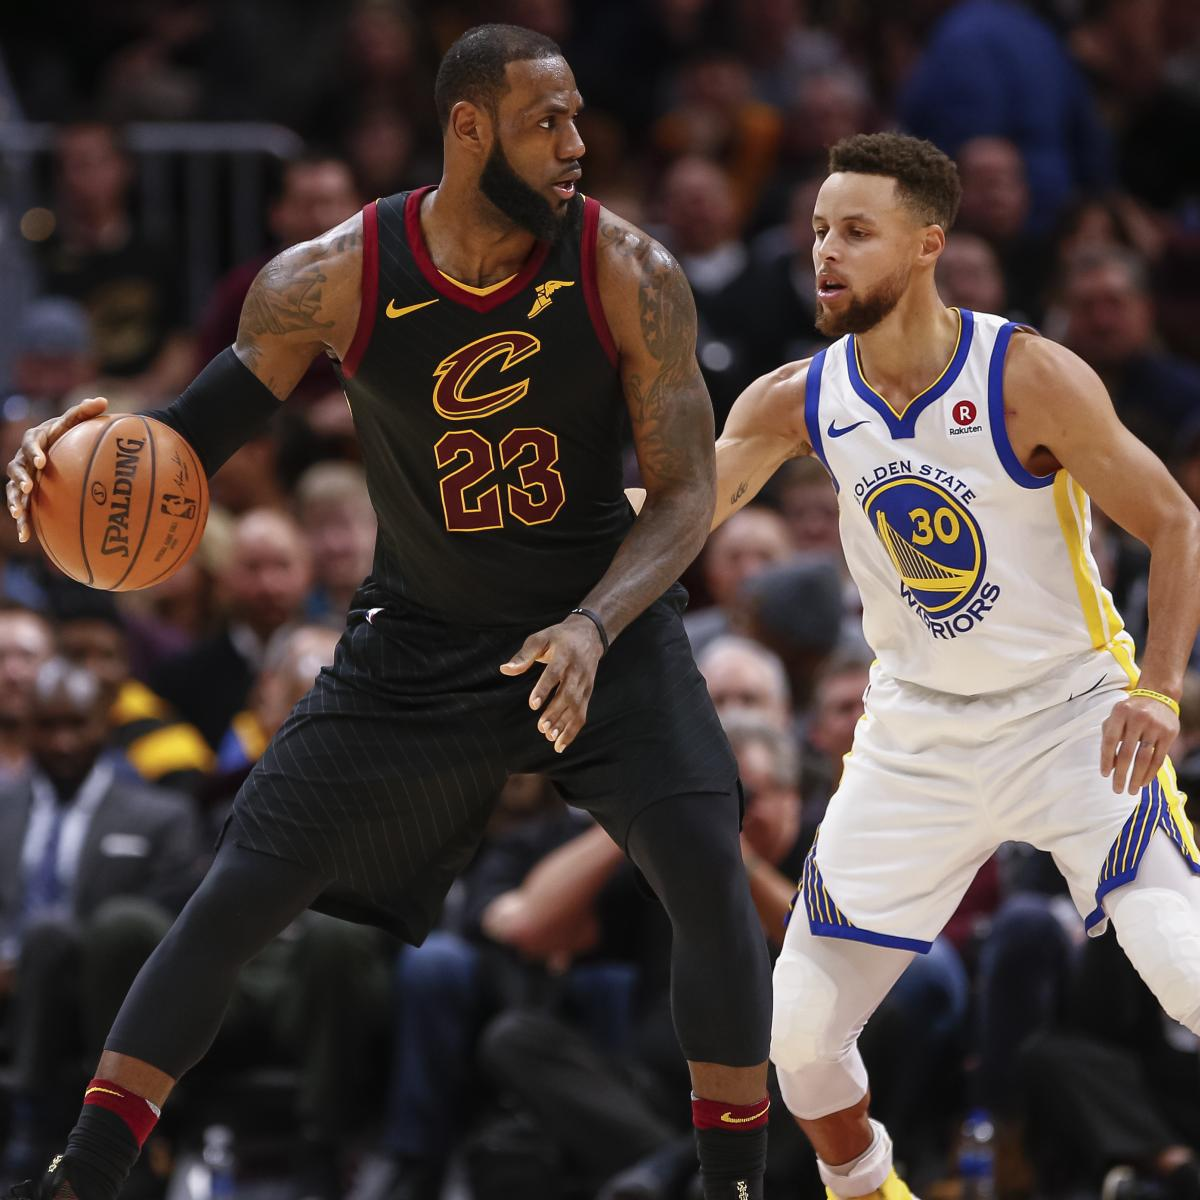 Warriors Timberwolves Full Game Highlights: Stephen Curry, LeBron James Headline US Men's Basketball